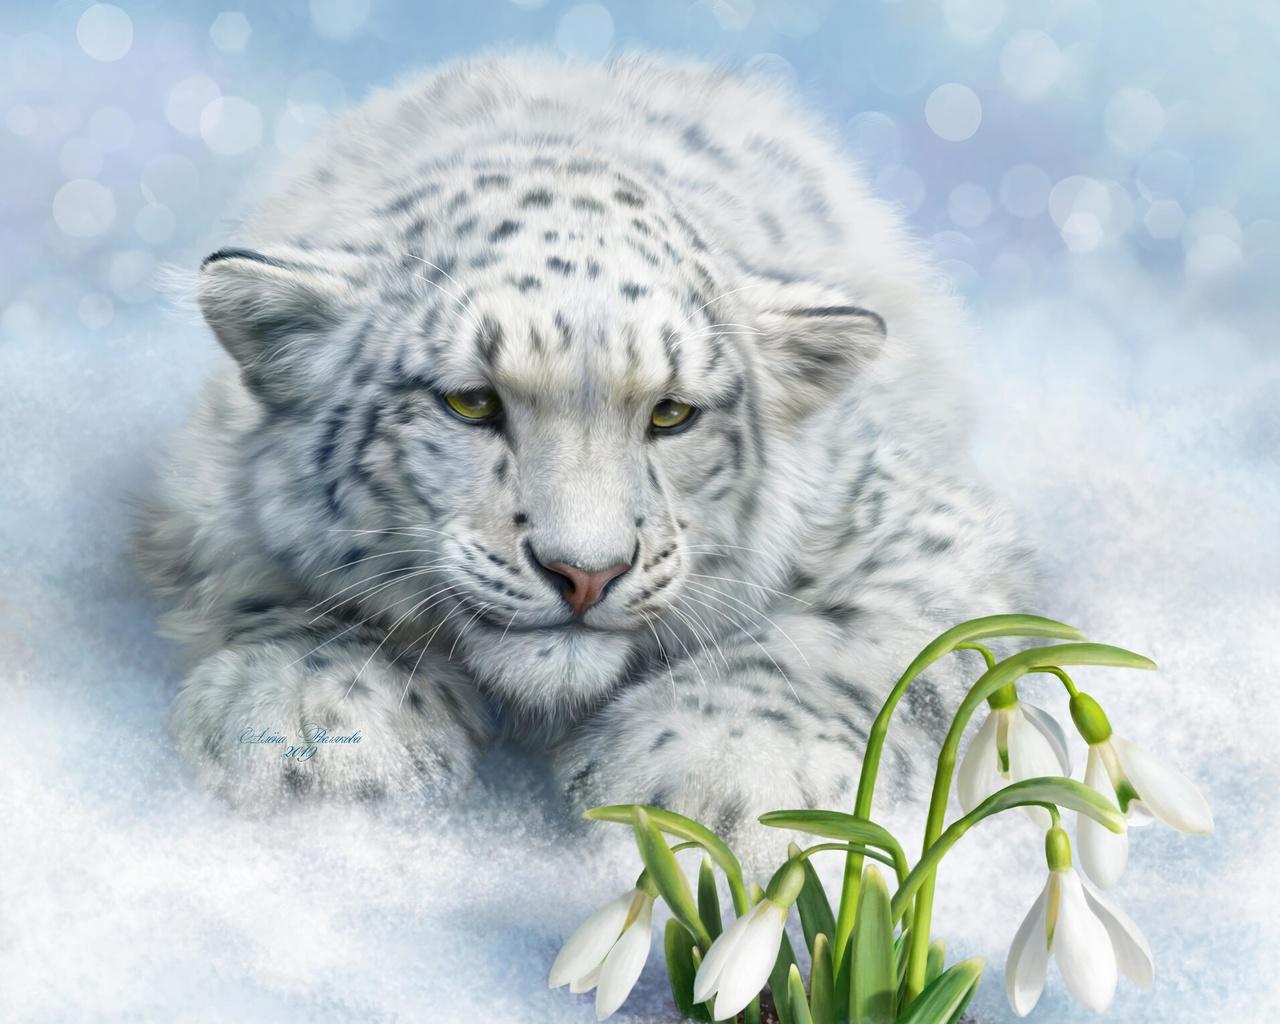 леопард, большая кошка, белый, цветы, арт